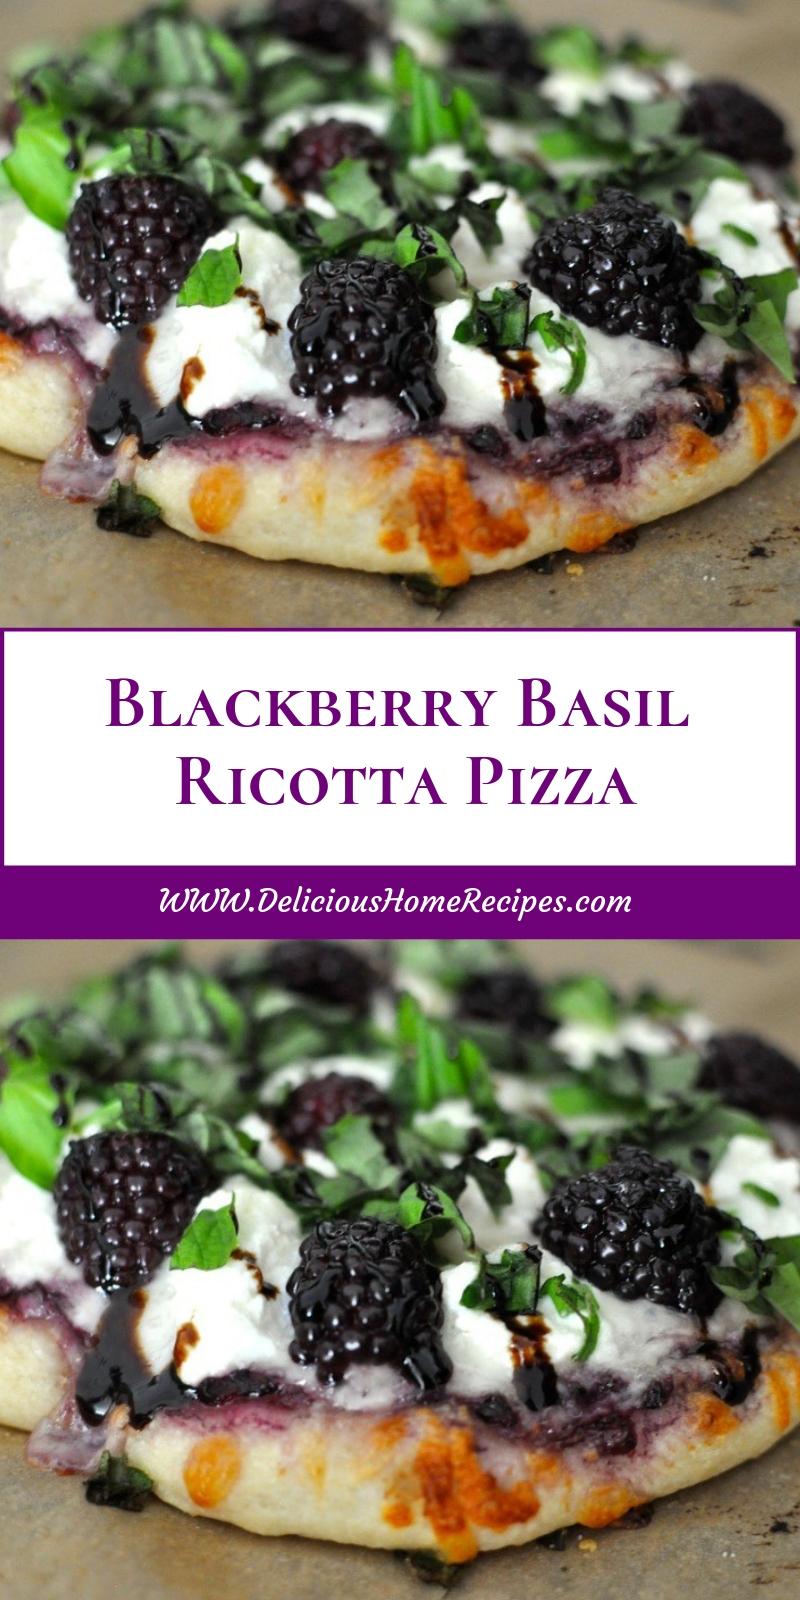 Blackberry Basil Ricotta Pizza